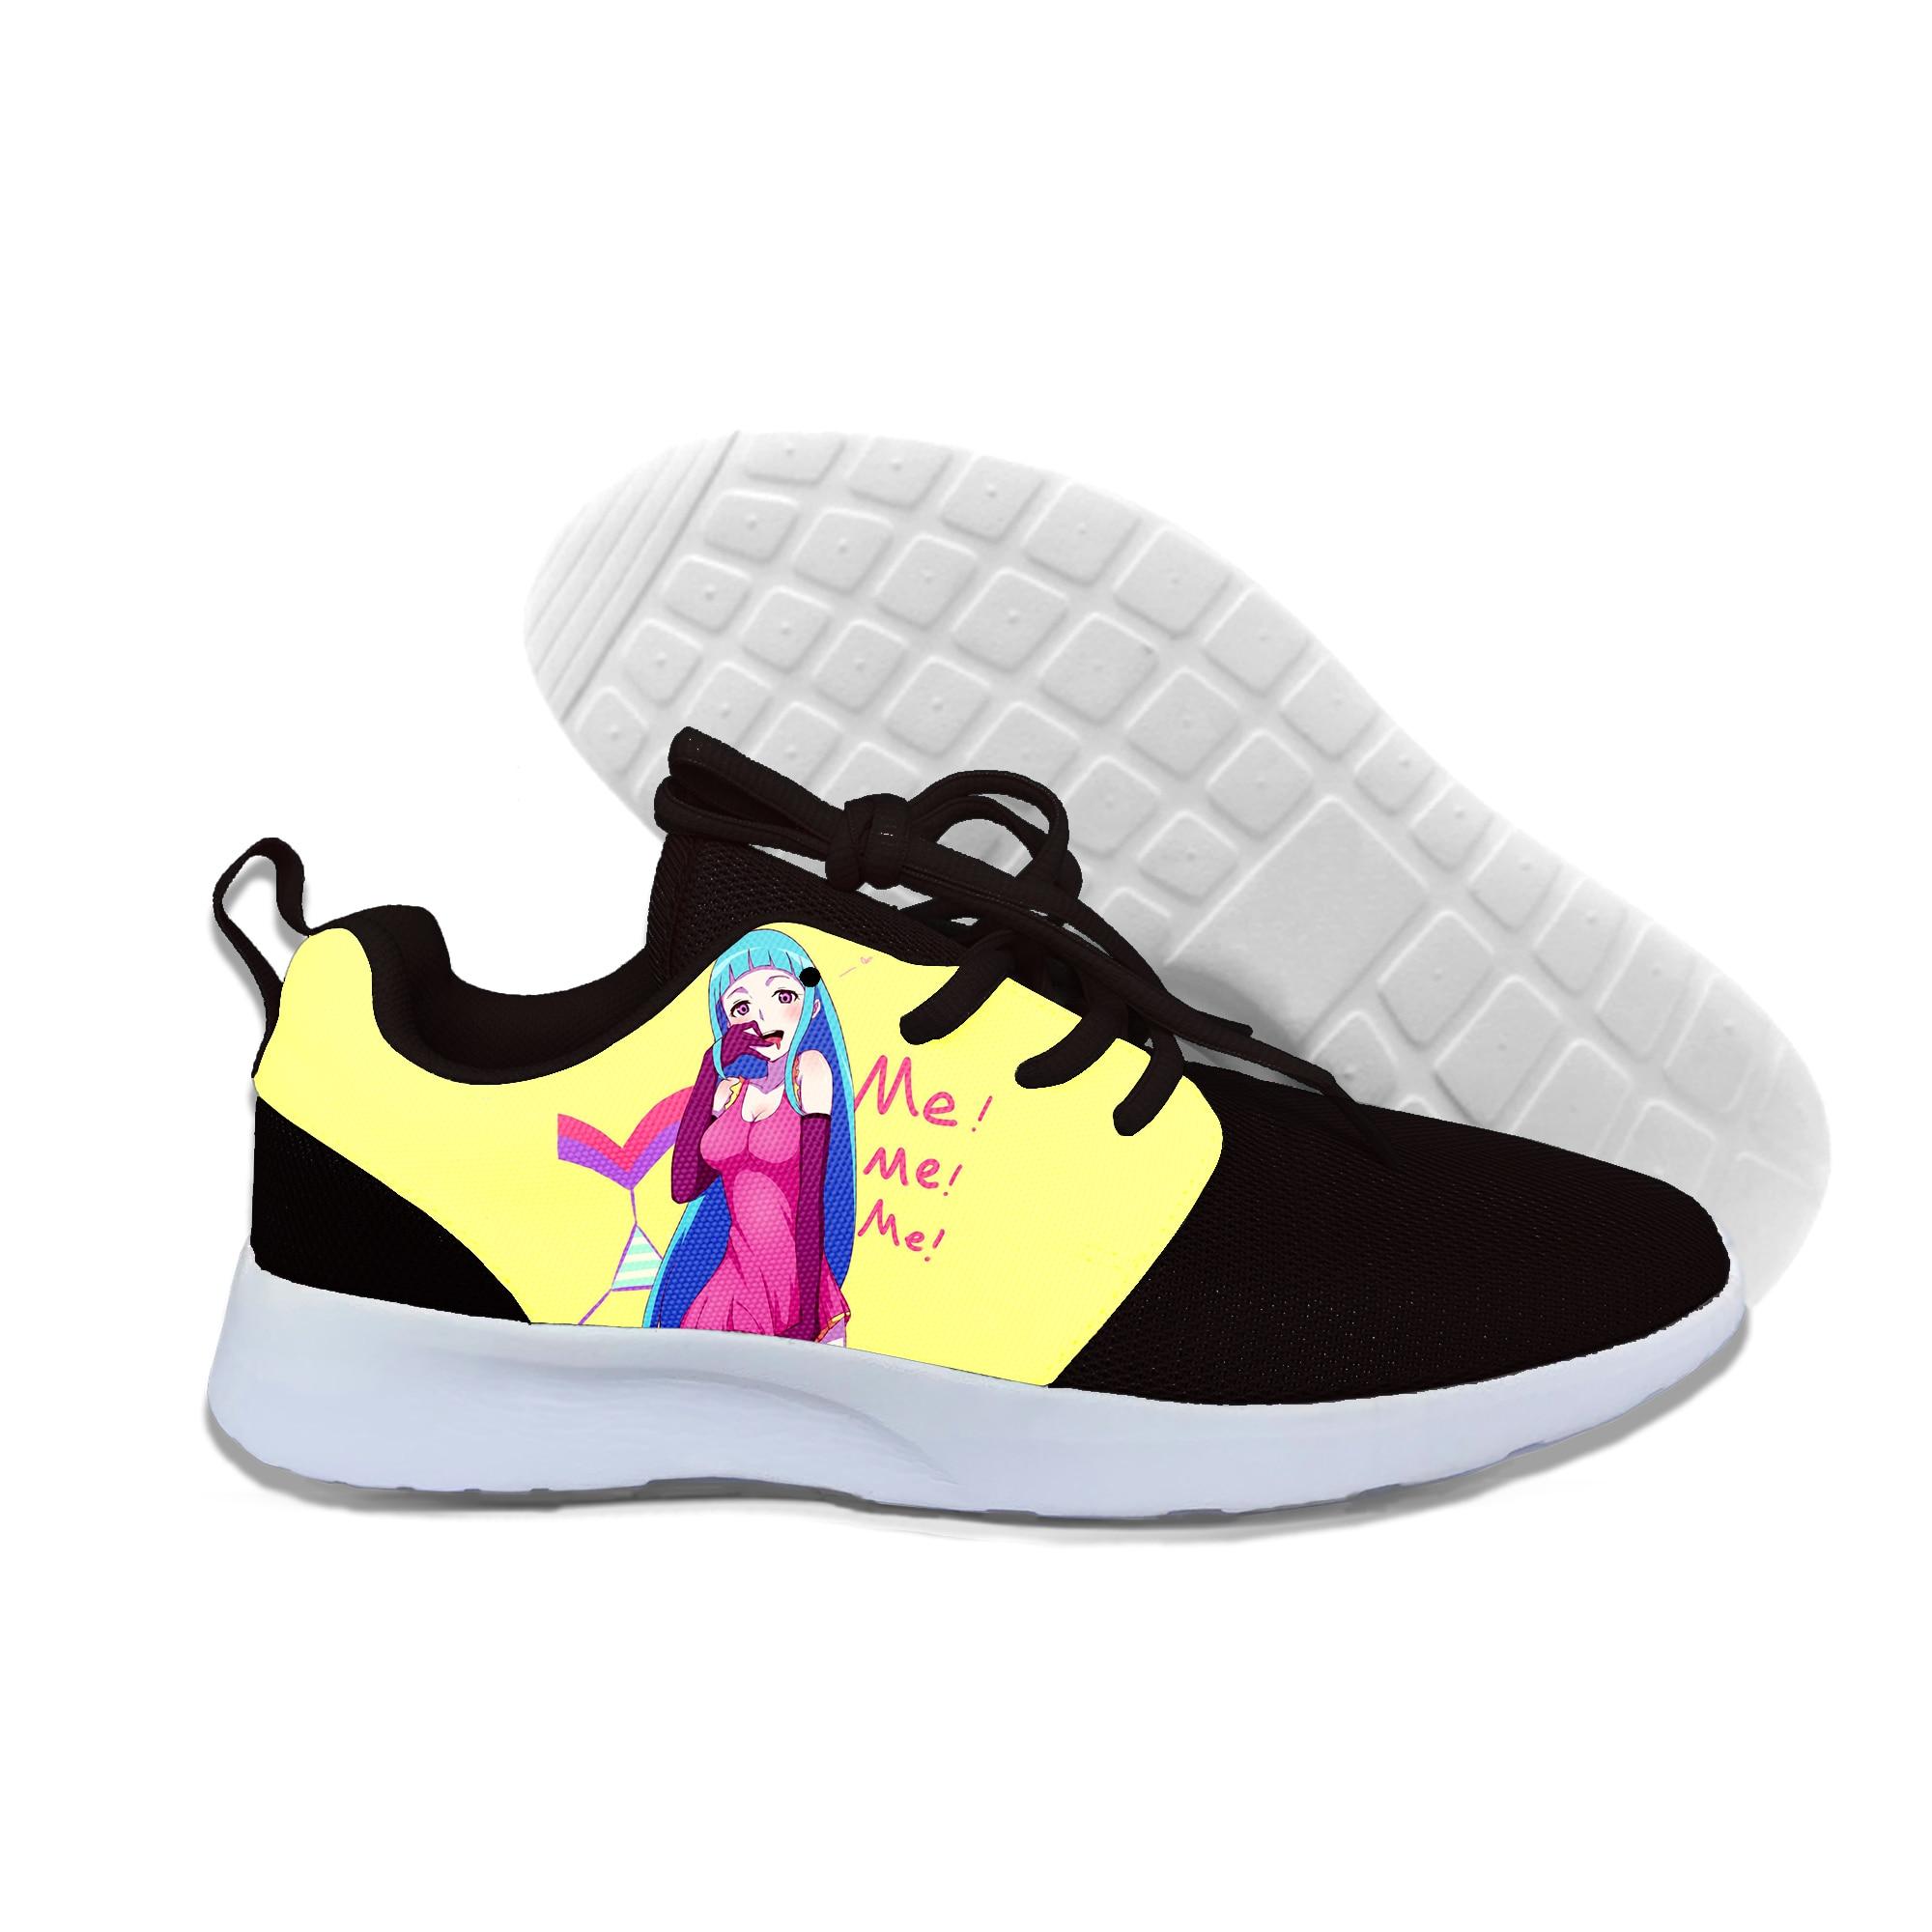 2019 hot fashion MEMEME 3D casual shoes for men/women high quality Harajuku 3D printing MEMEME Sneakers